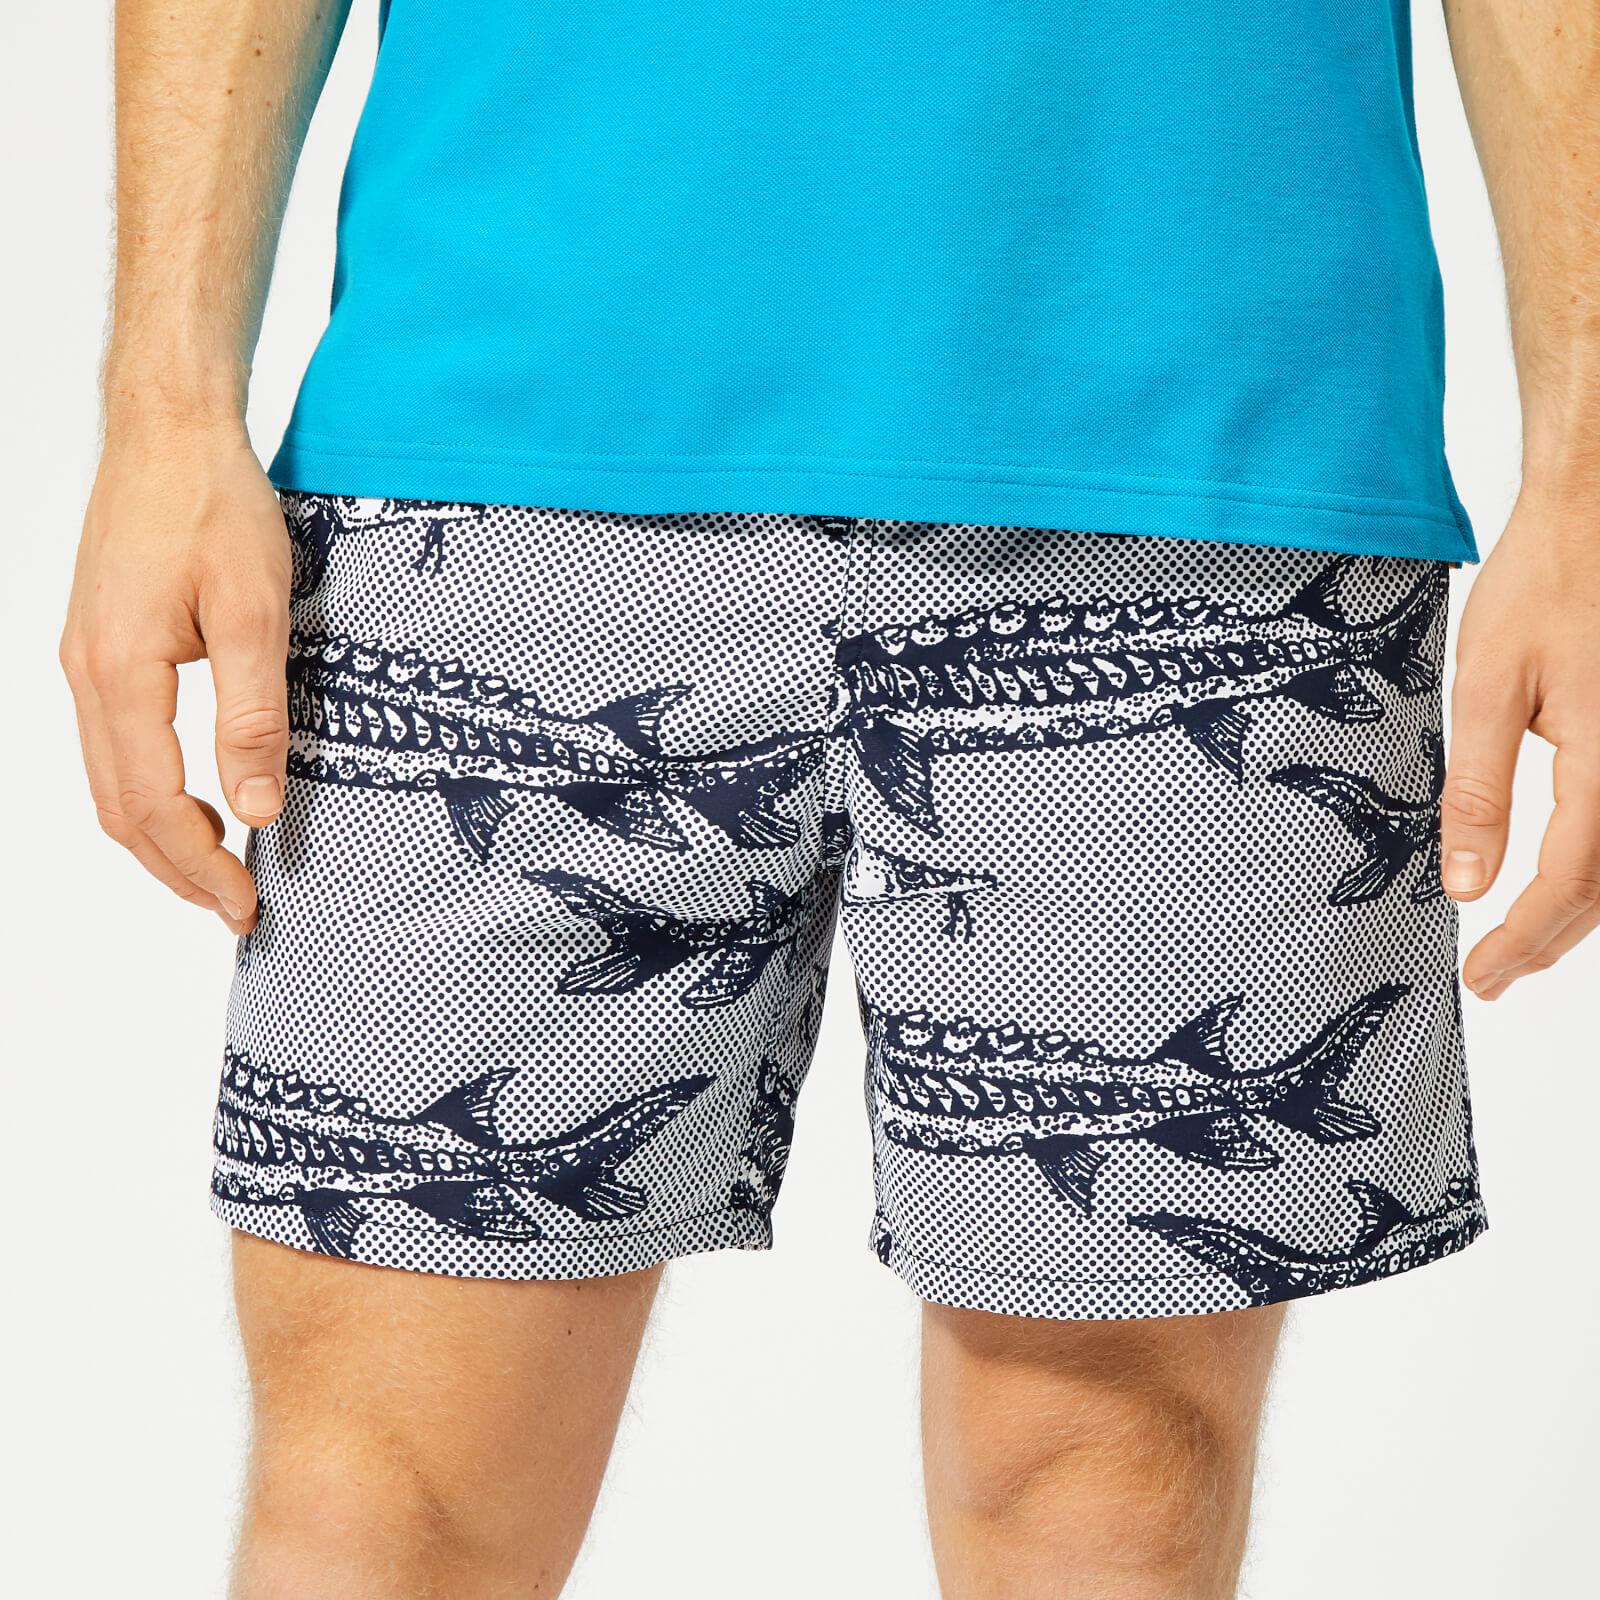 feaa99e81e1d9 Vilebrequin Men's Moorea Large Fish Print Swim Shorts - White - Free UK  Delivery over £50